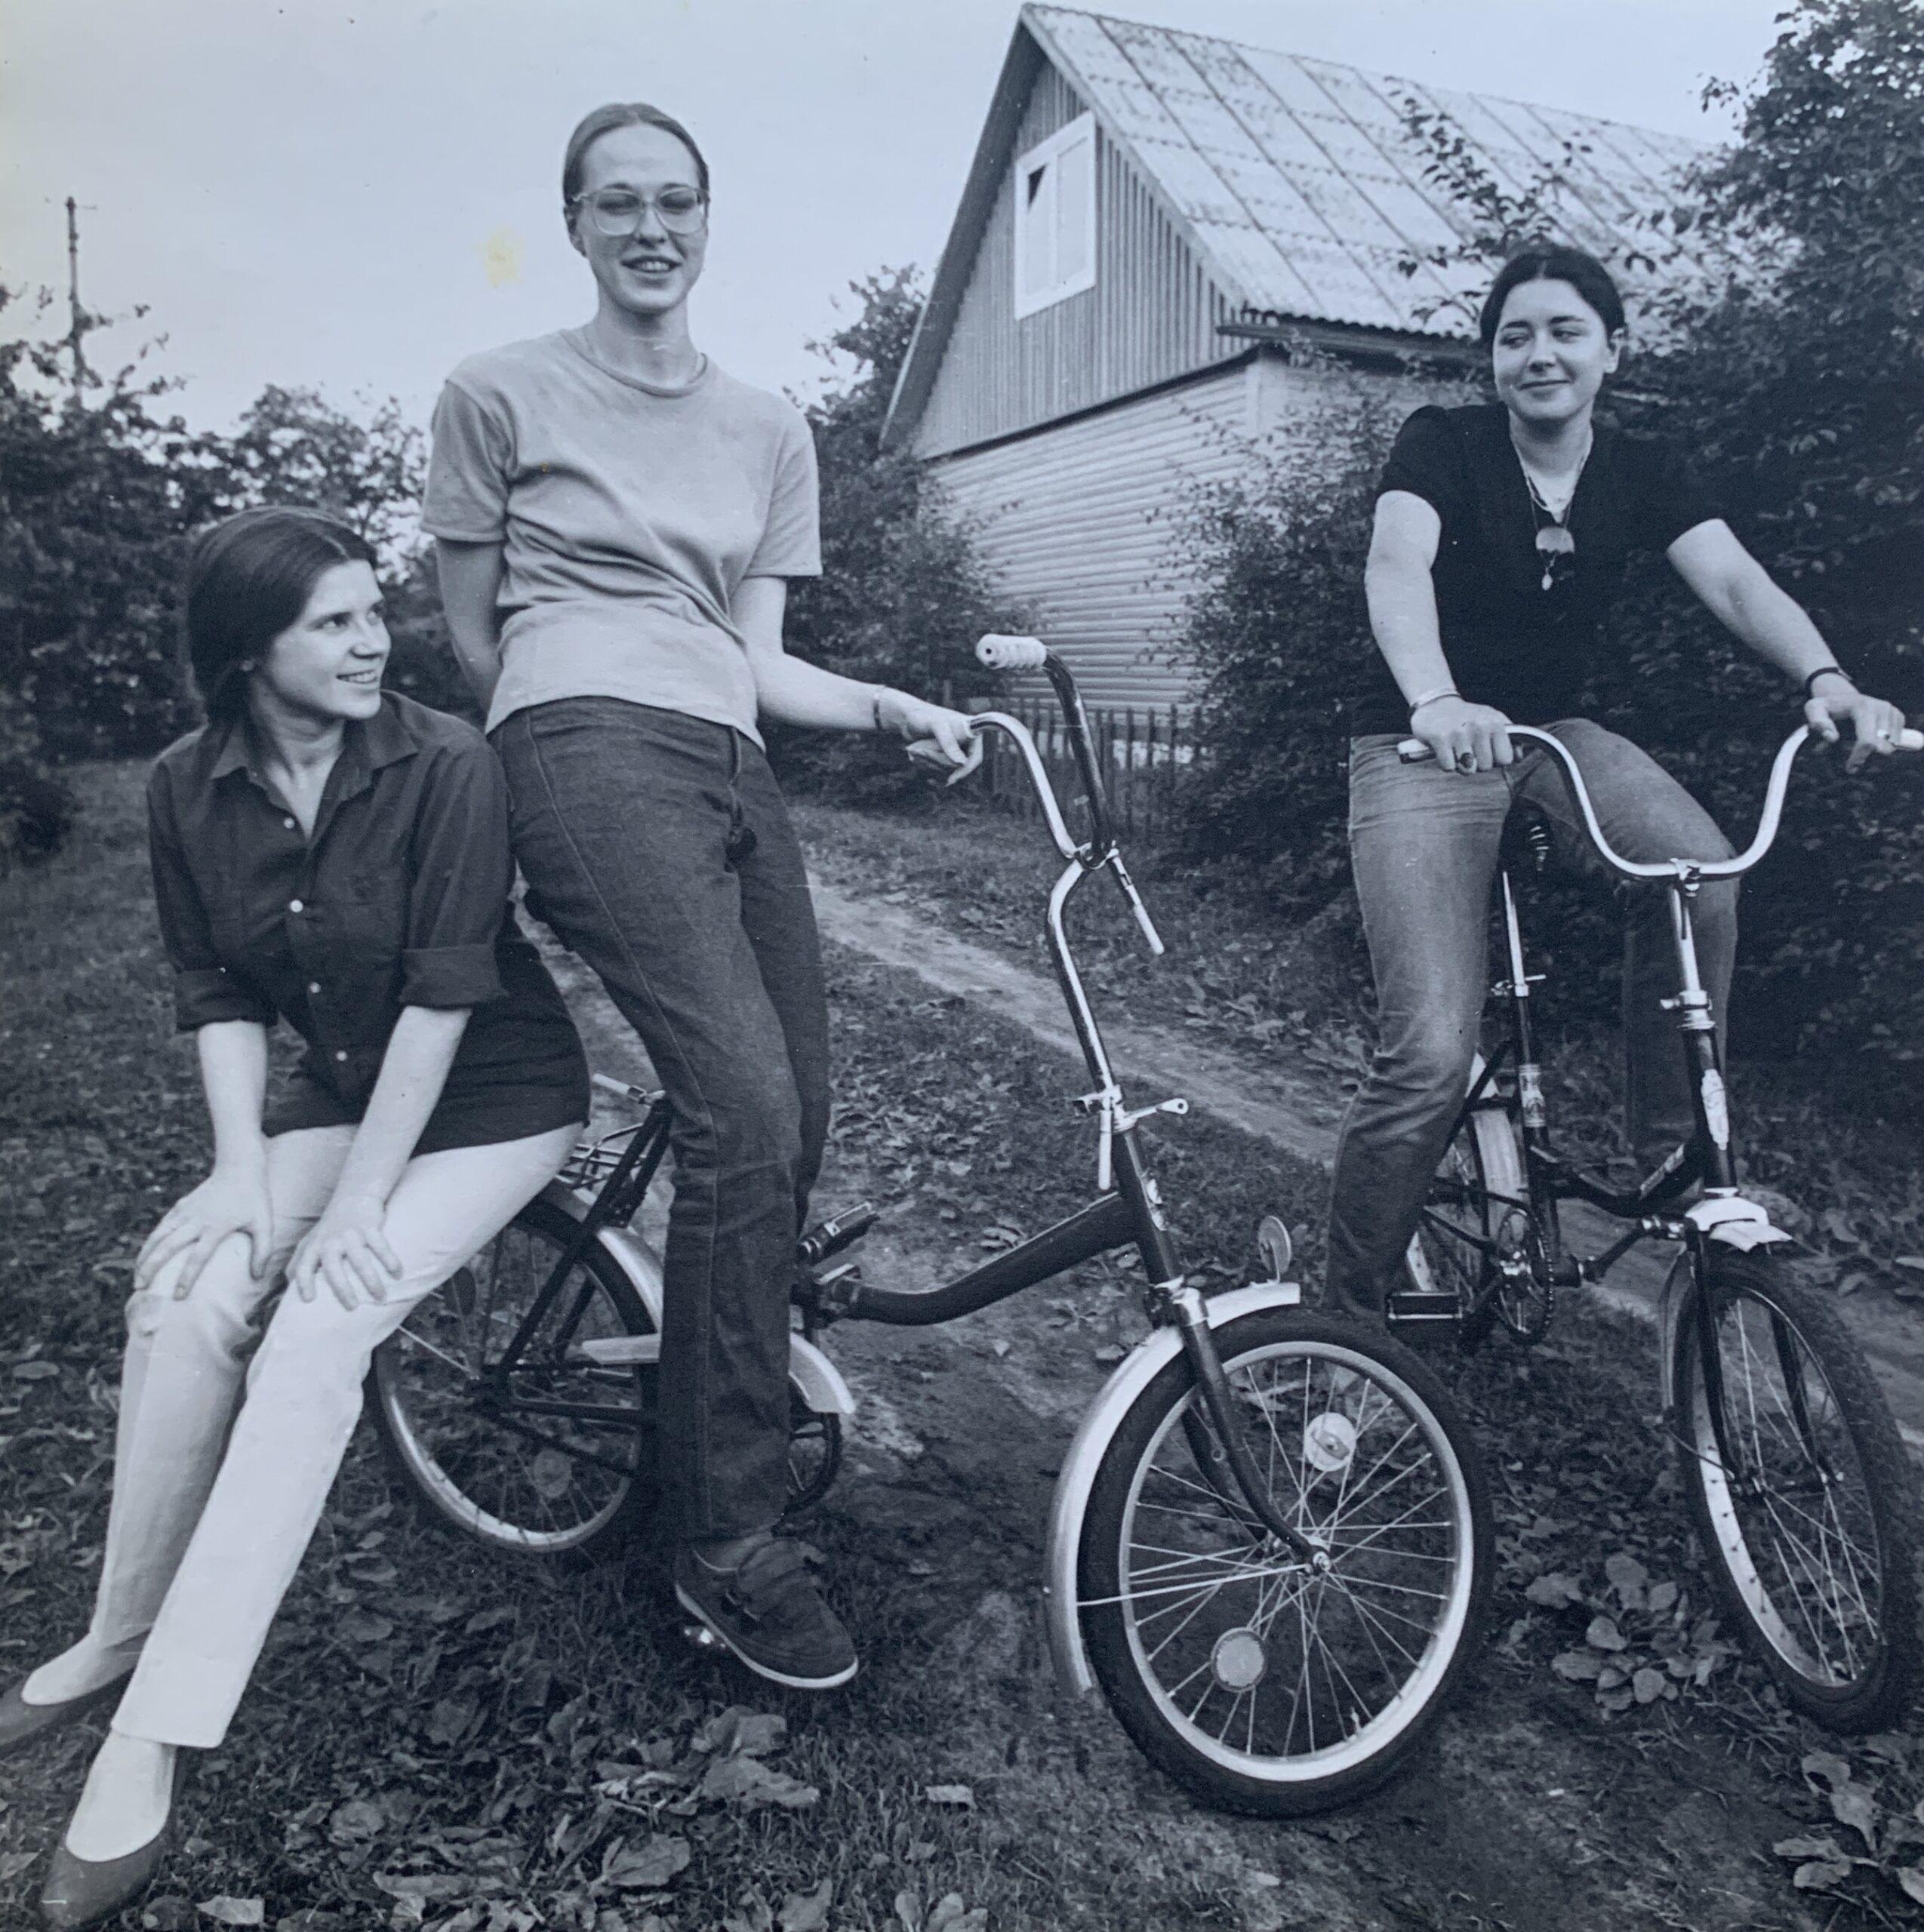 Su merginomis ant dviračio.